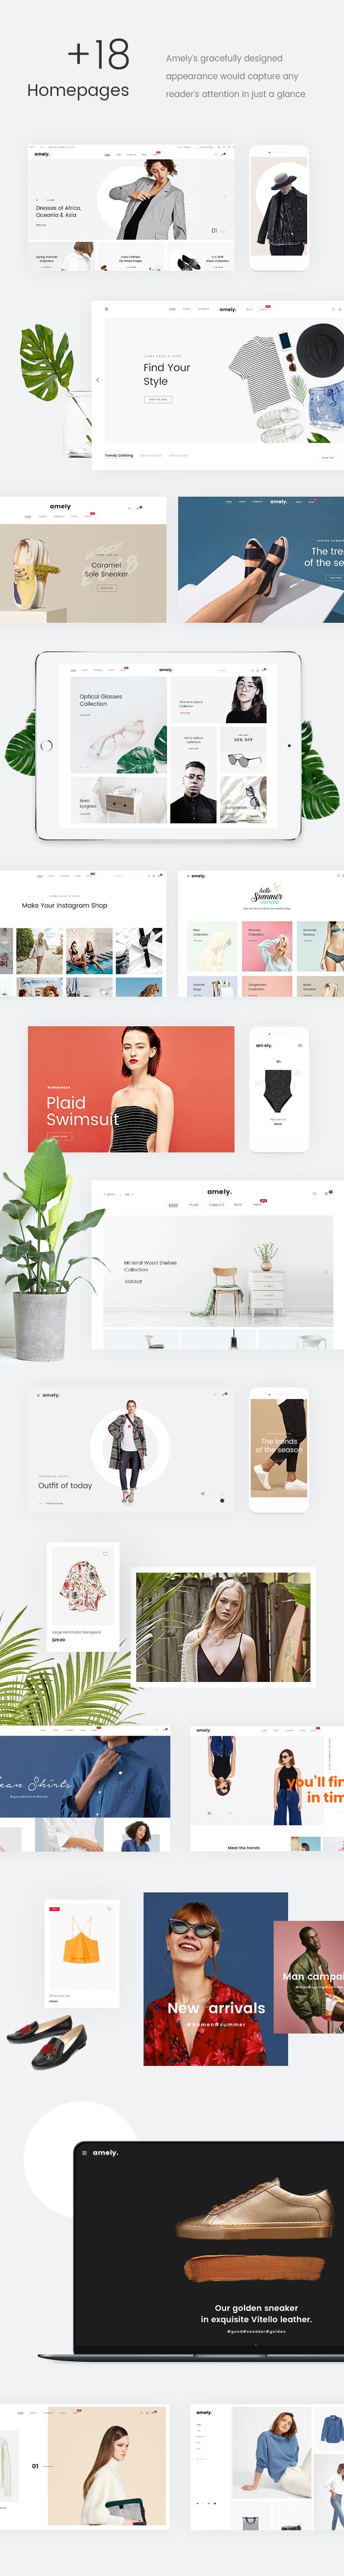 Mode WooCommerce WordPress Template - 18+ Homepages